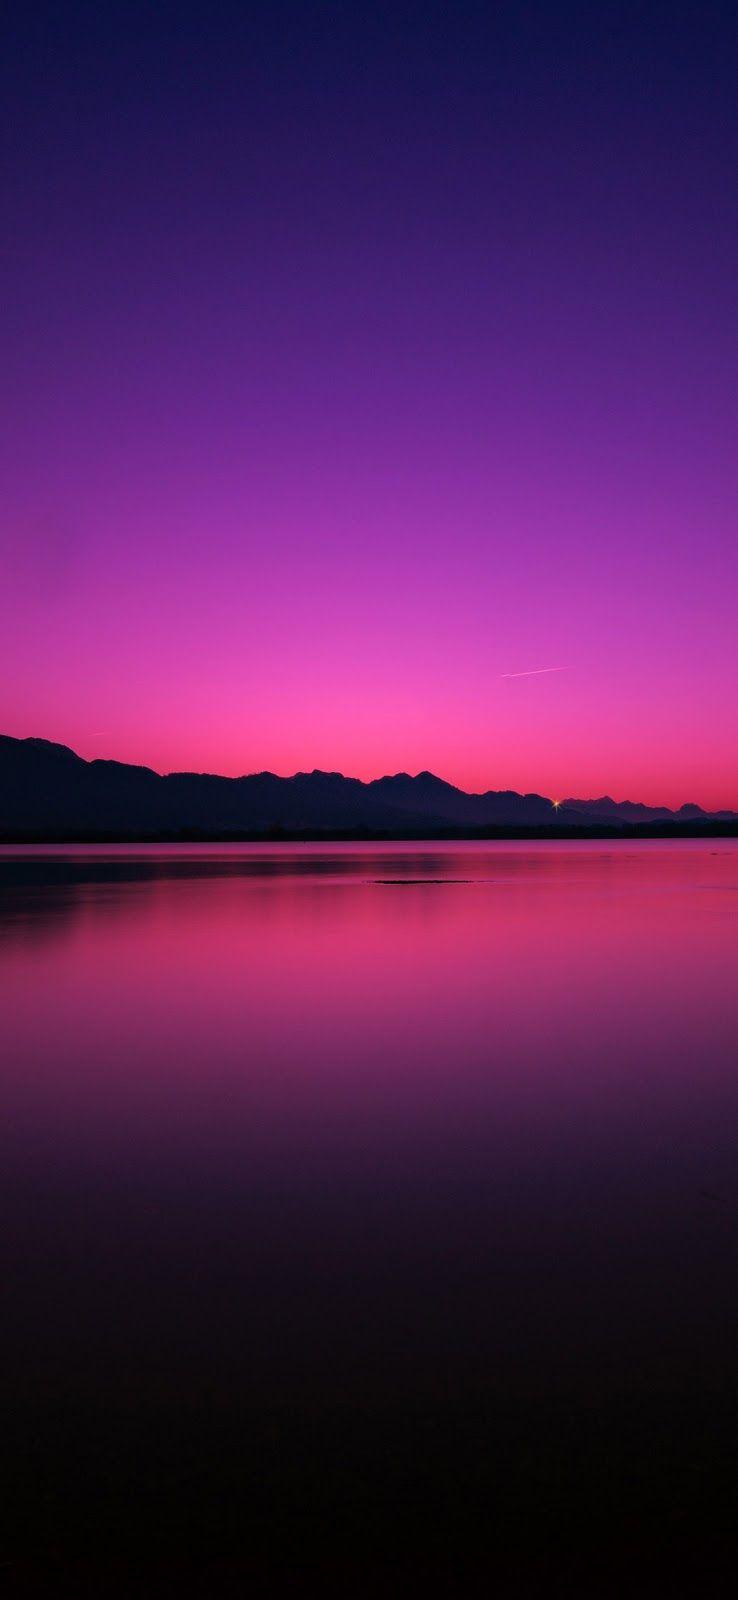 خلفيات ايفون انعكاس شفق الغروب فوق مياه البحيرة الهادئة Landscape Photography Nature Landscape Photography Sky Aesthetic